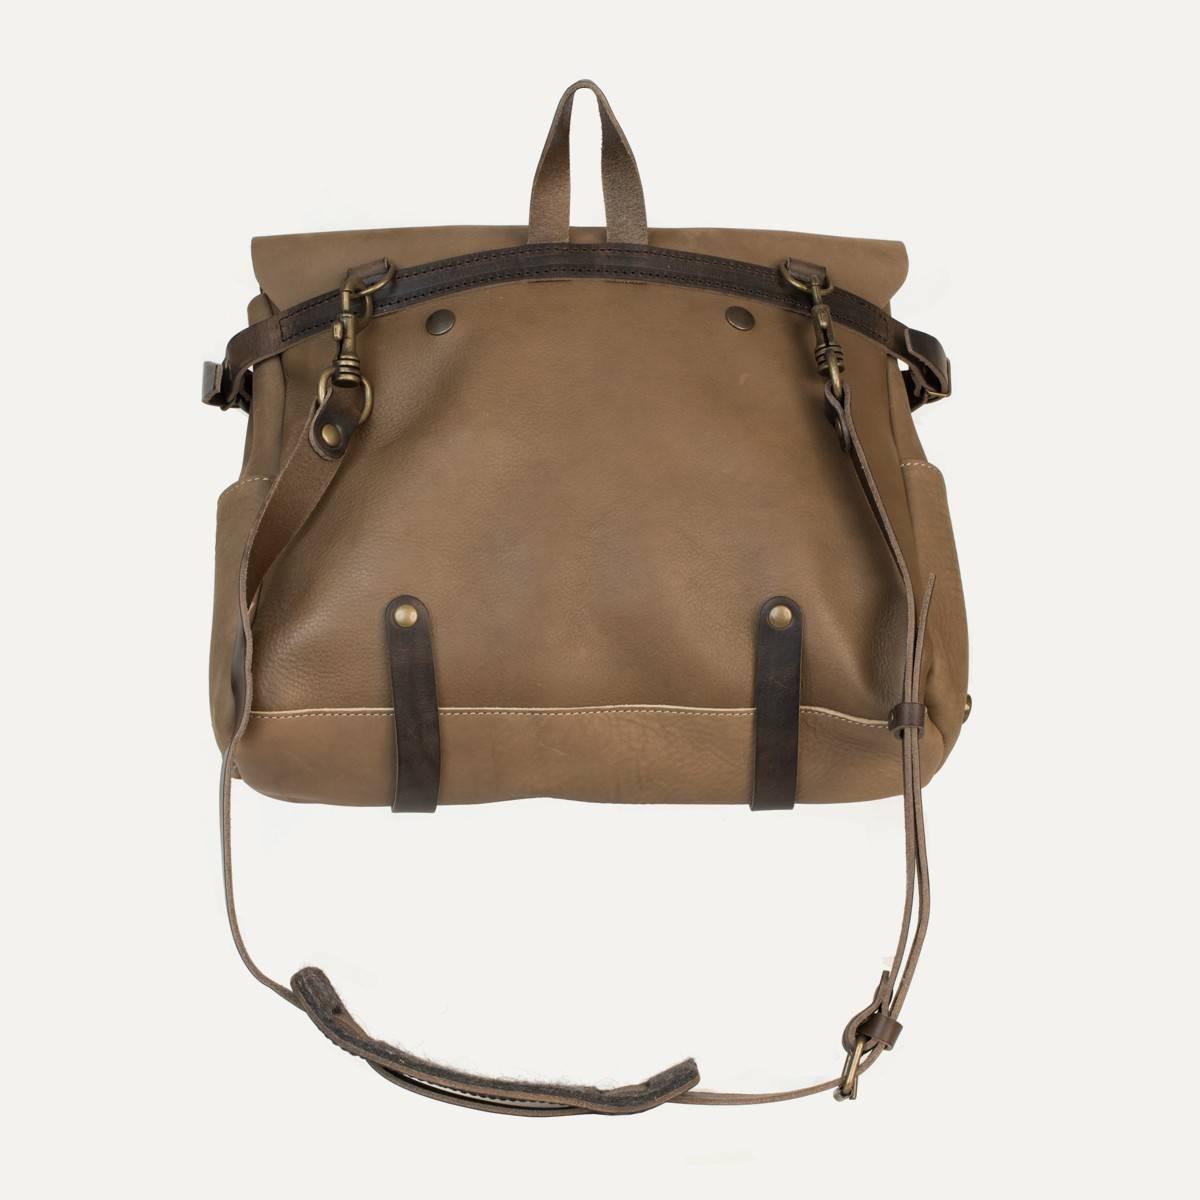 Postman bag Eclair - Taupe (image n°4)